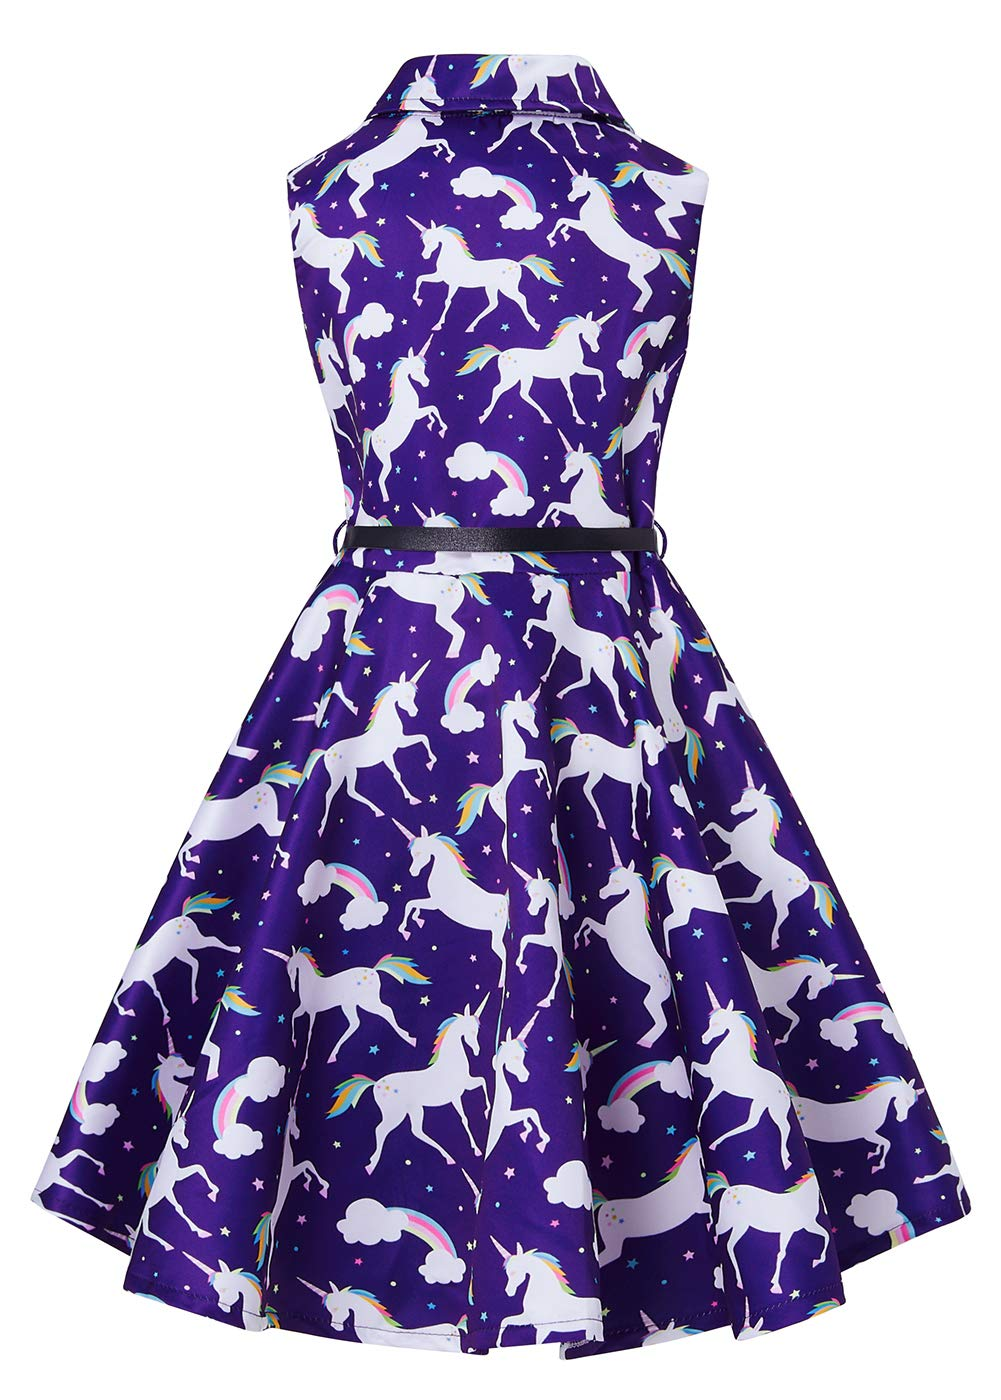 RAISEVERN Girls Unicorn Rainbow Dress Slim Fit Waist Knee Length A-Line Sleeveless Dresses with Belt Dark Navy Blue Purple